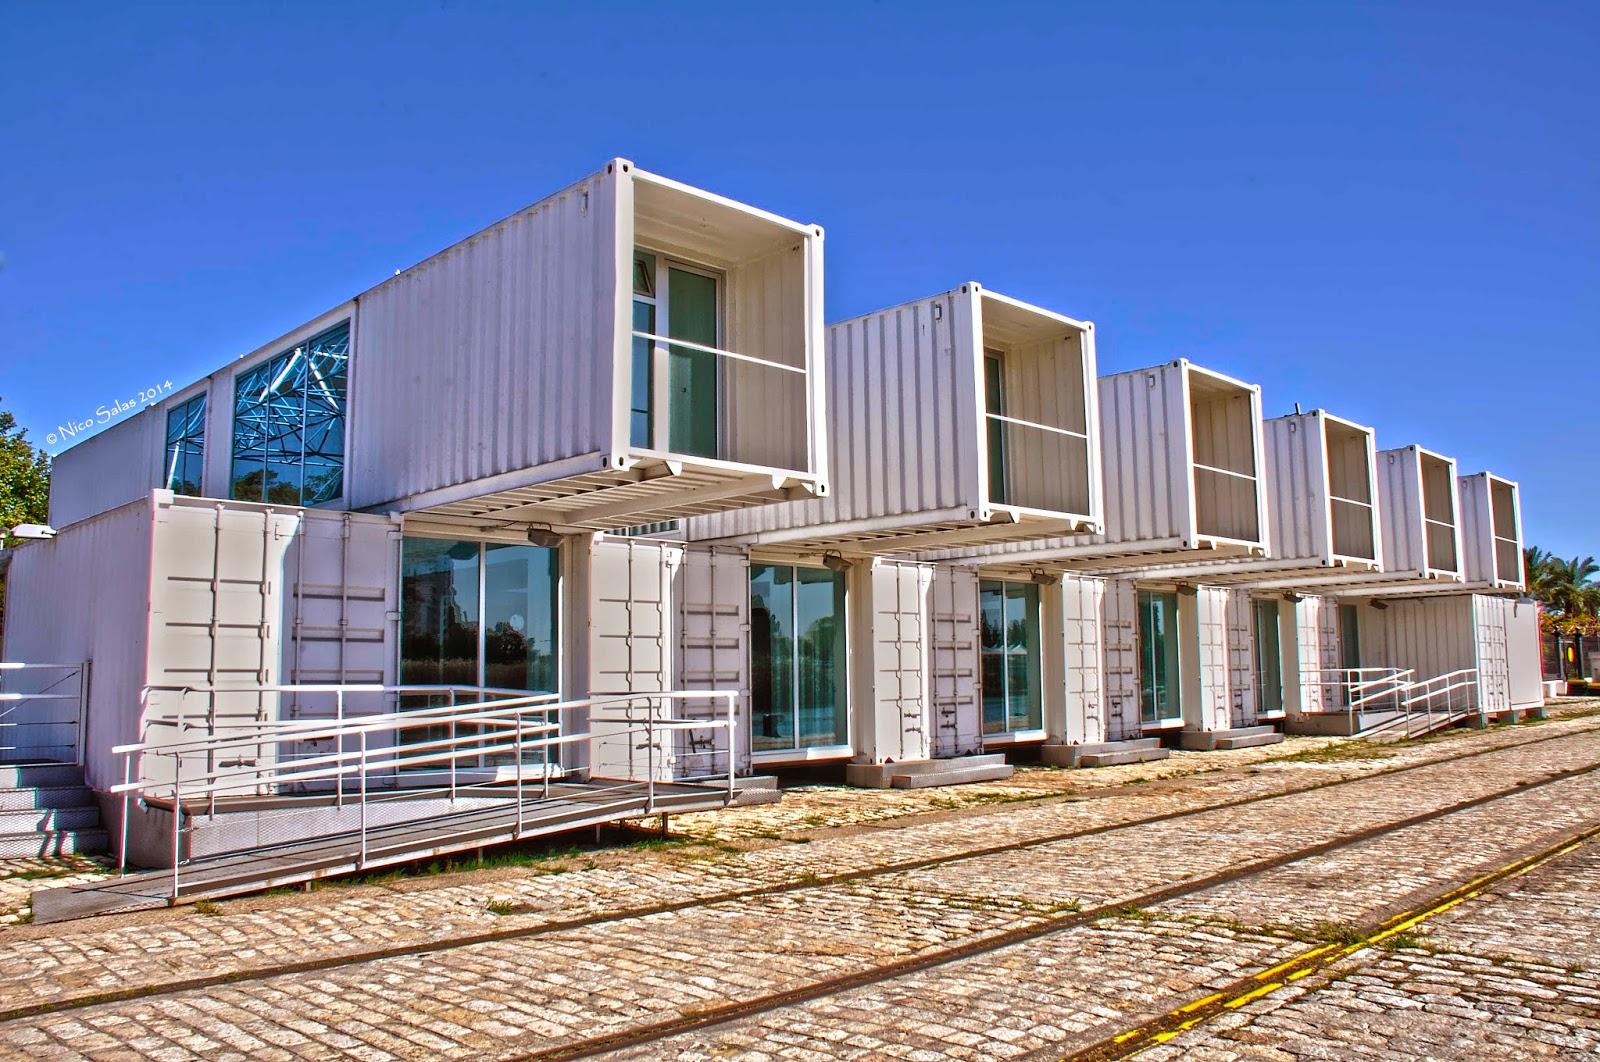 Container art un nuevo espacio cultural sevilla21 for Arquitectura modular